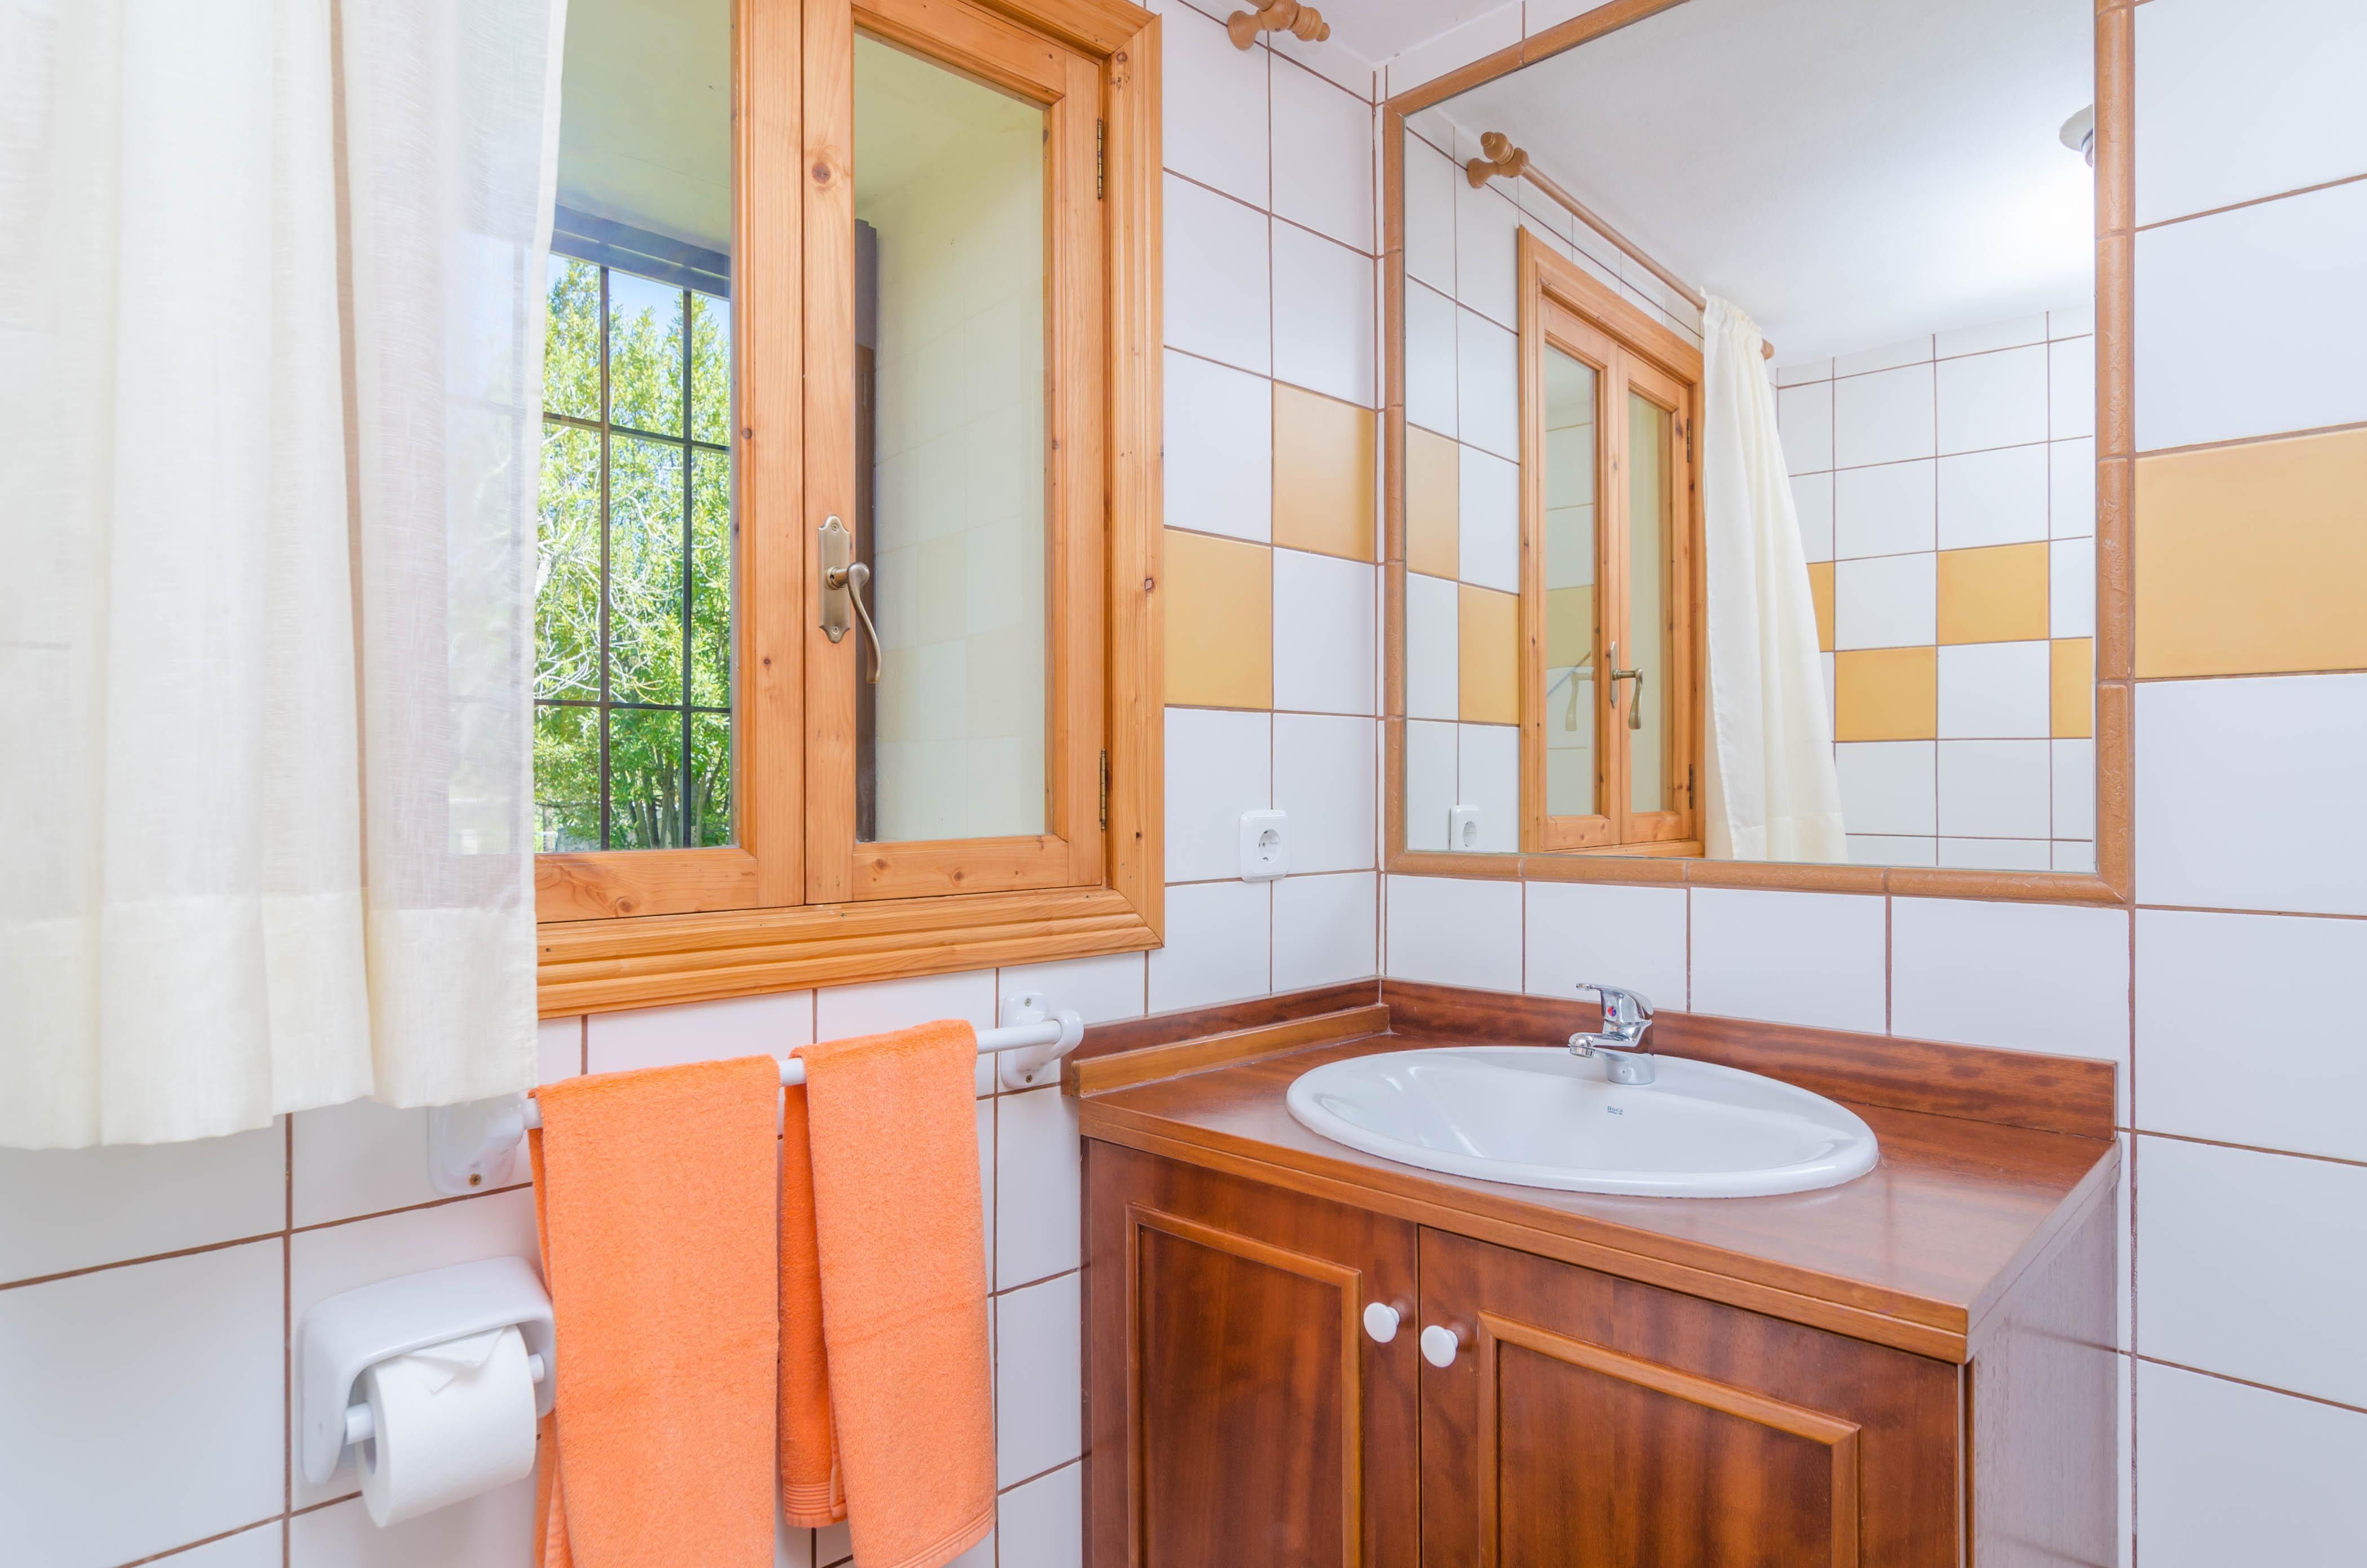 Ferienhaus SON MACIA (2186582), Son Macià, Mallorca, Balearische Inseln, Spanien, Bild 28